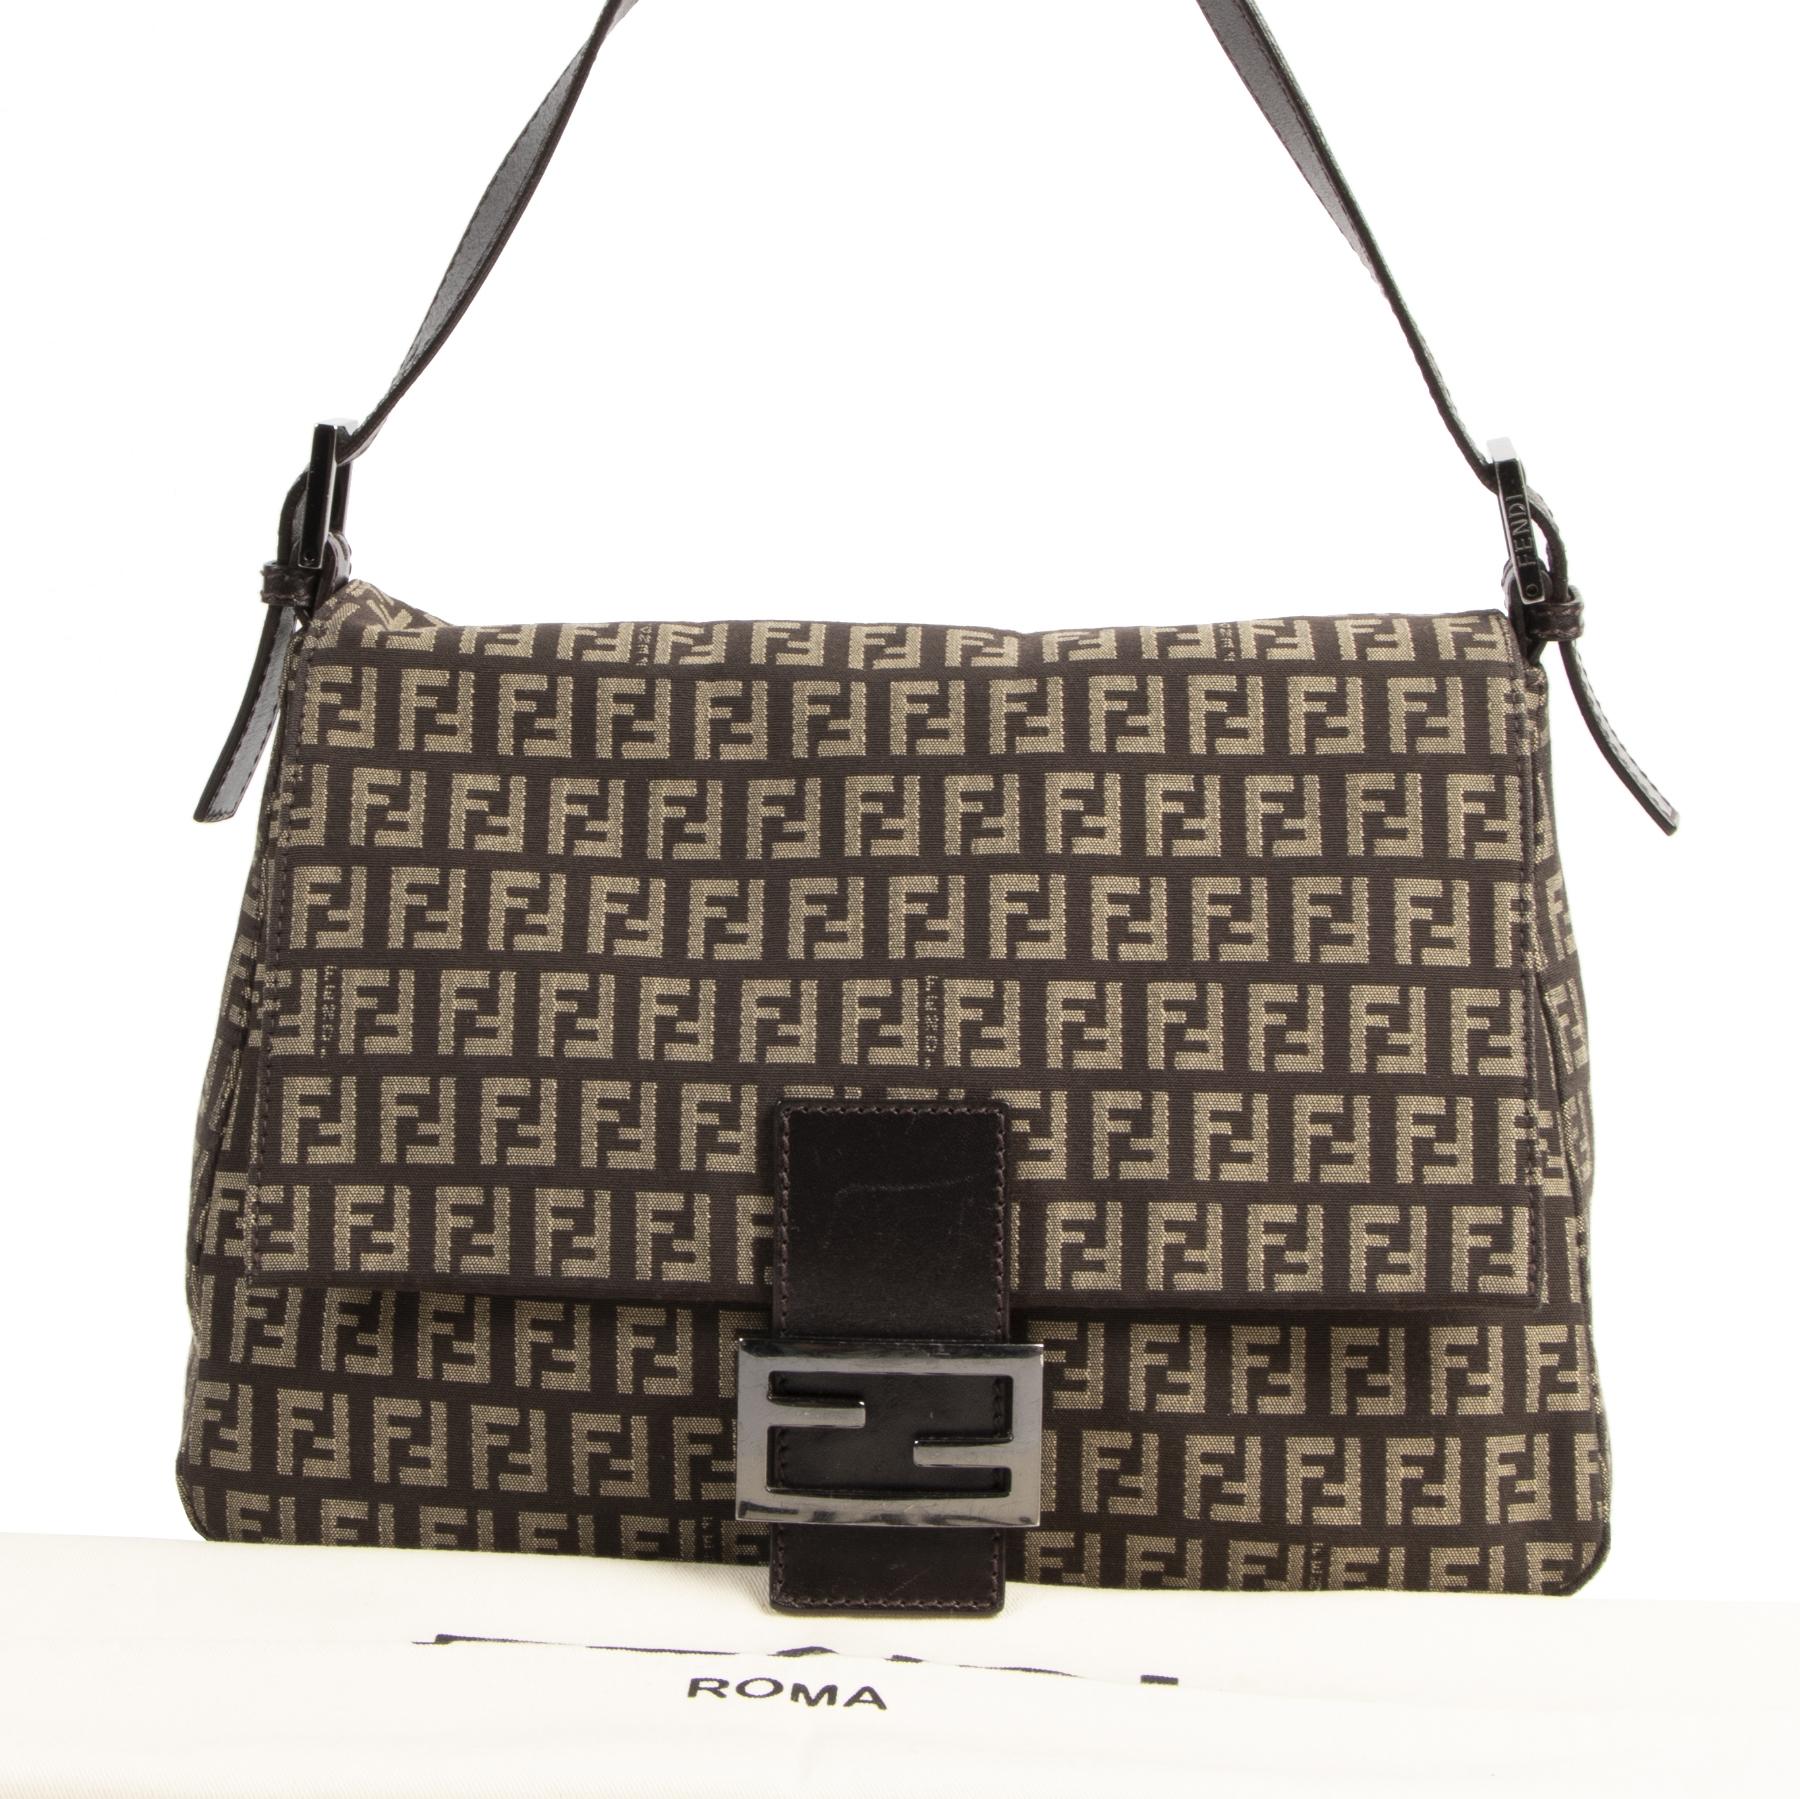 Authentic secondhand Fendi Zucca Baguette Bag designer bags fashion luxury vintage webshop safe secure online shopping